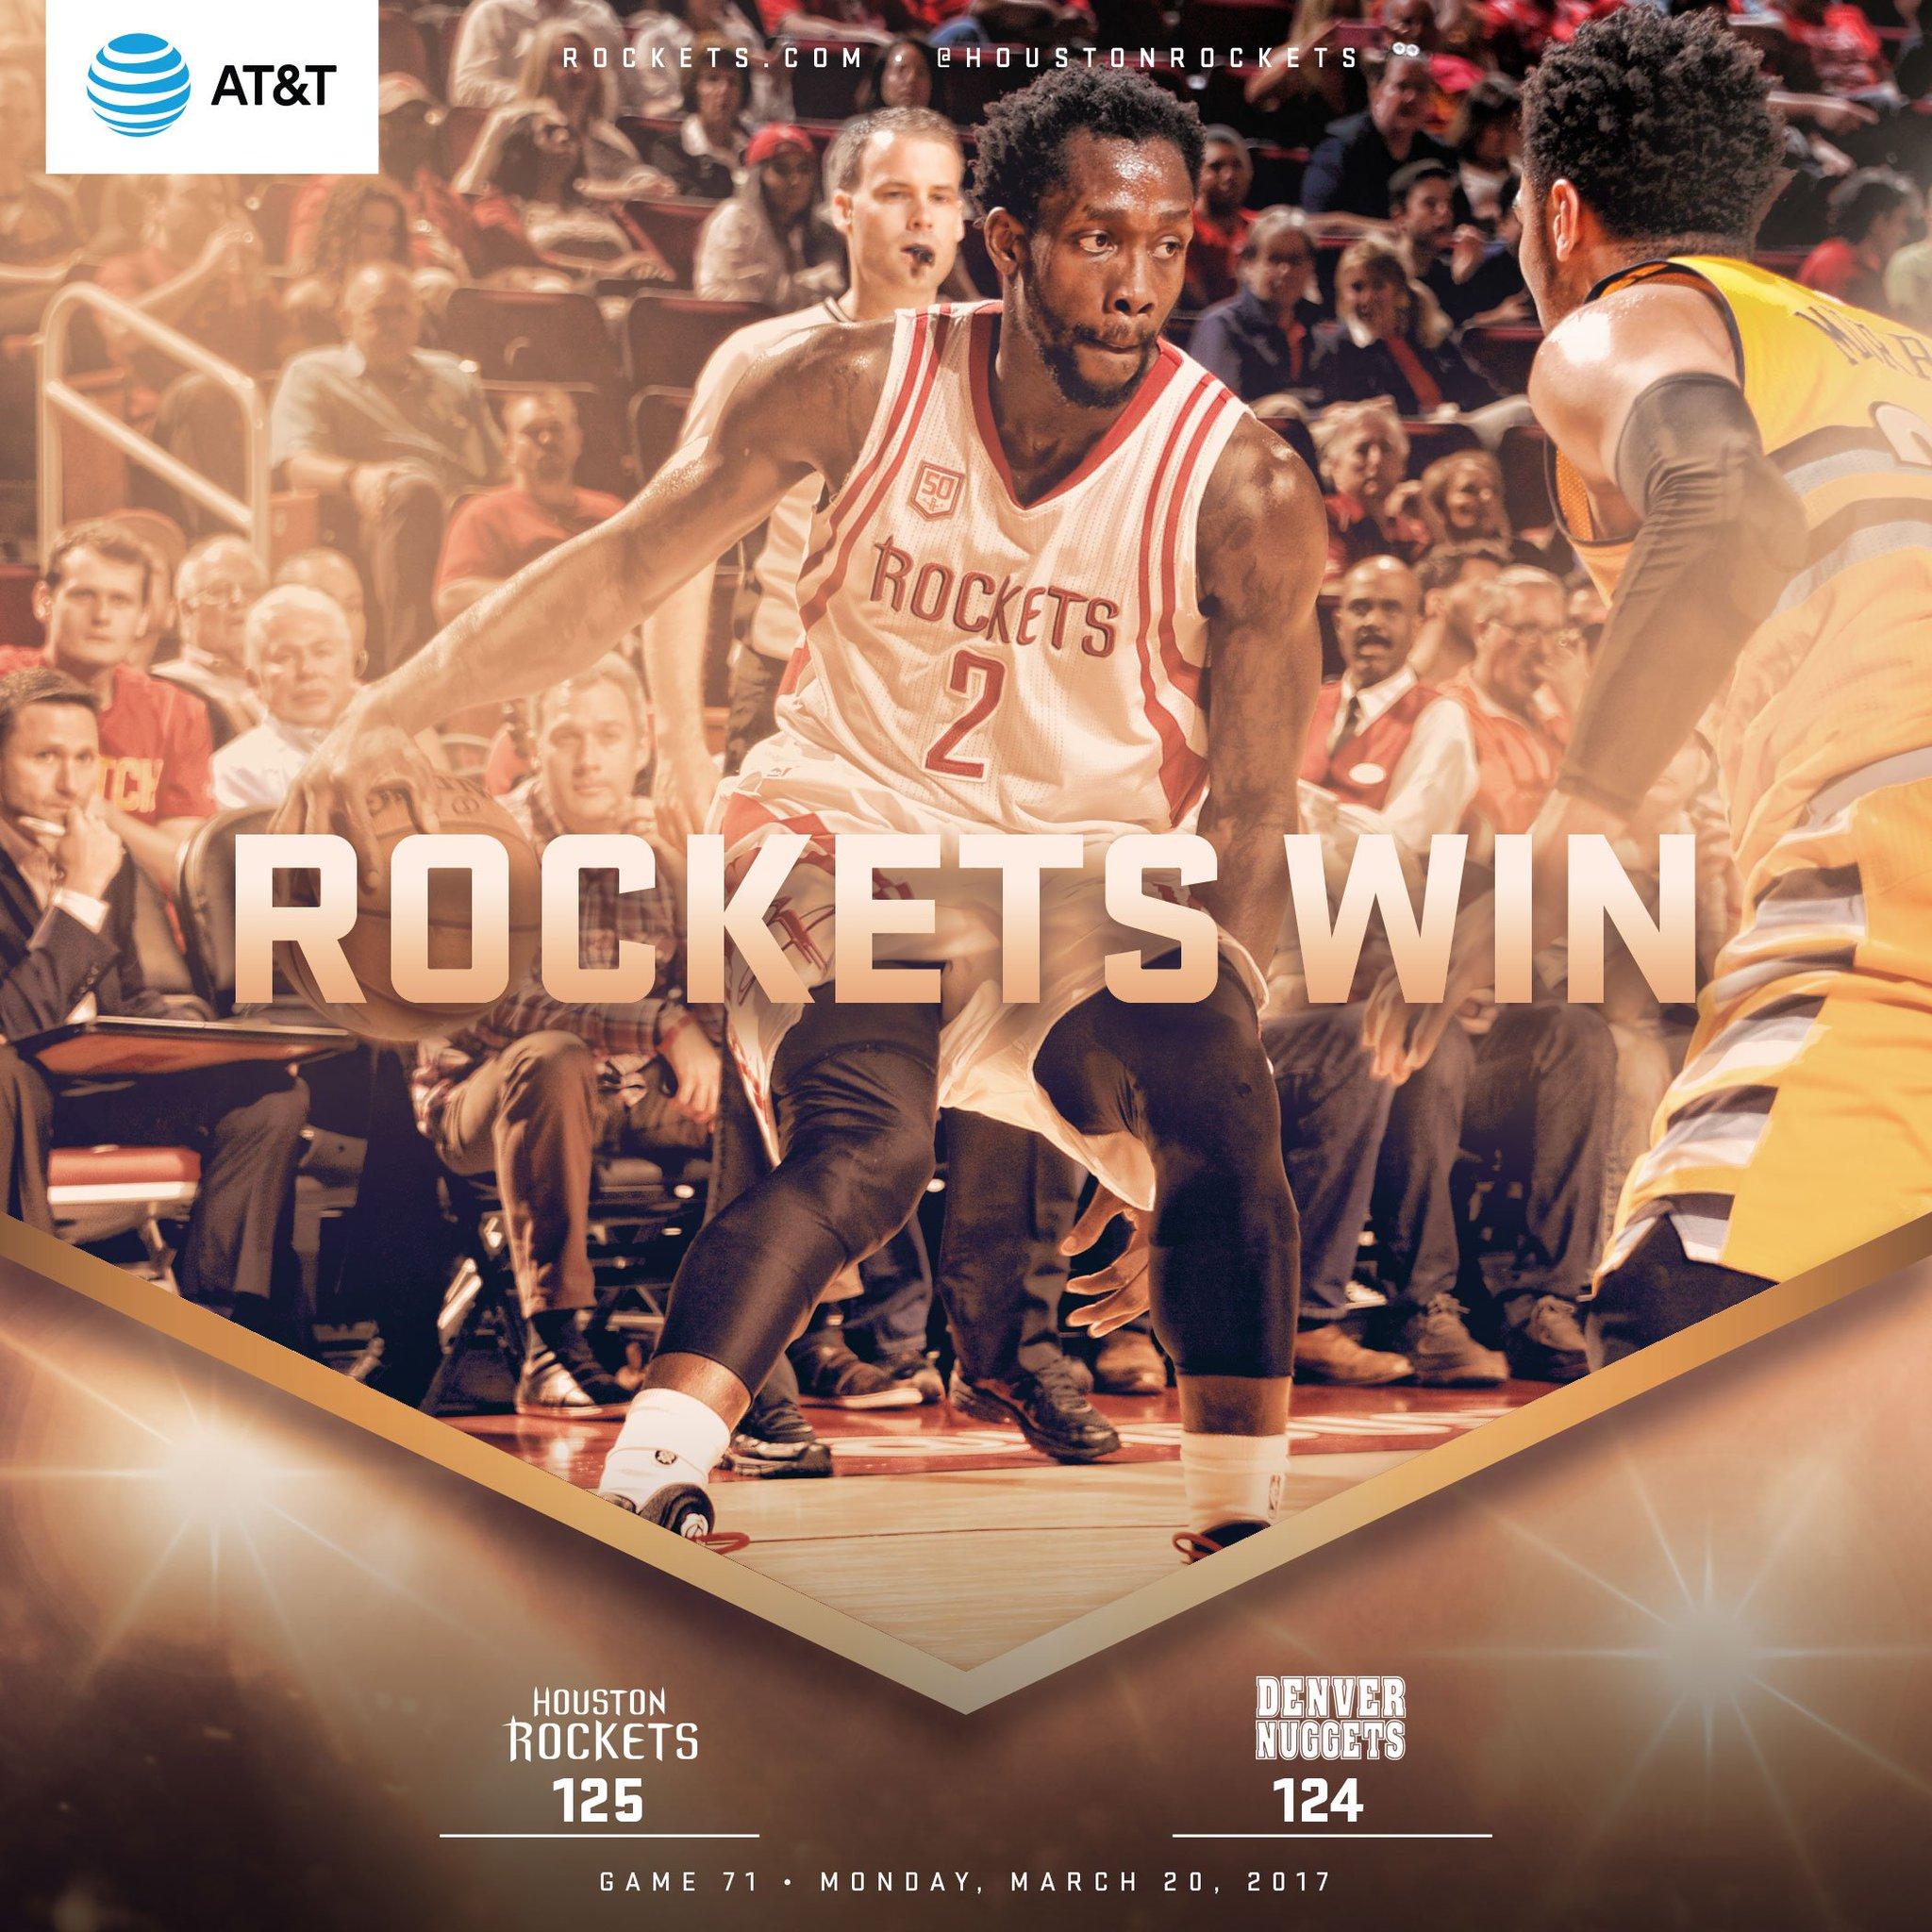 A true TEAM effort! #Rockets50 https://t.co/jIM2kjt83K